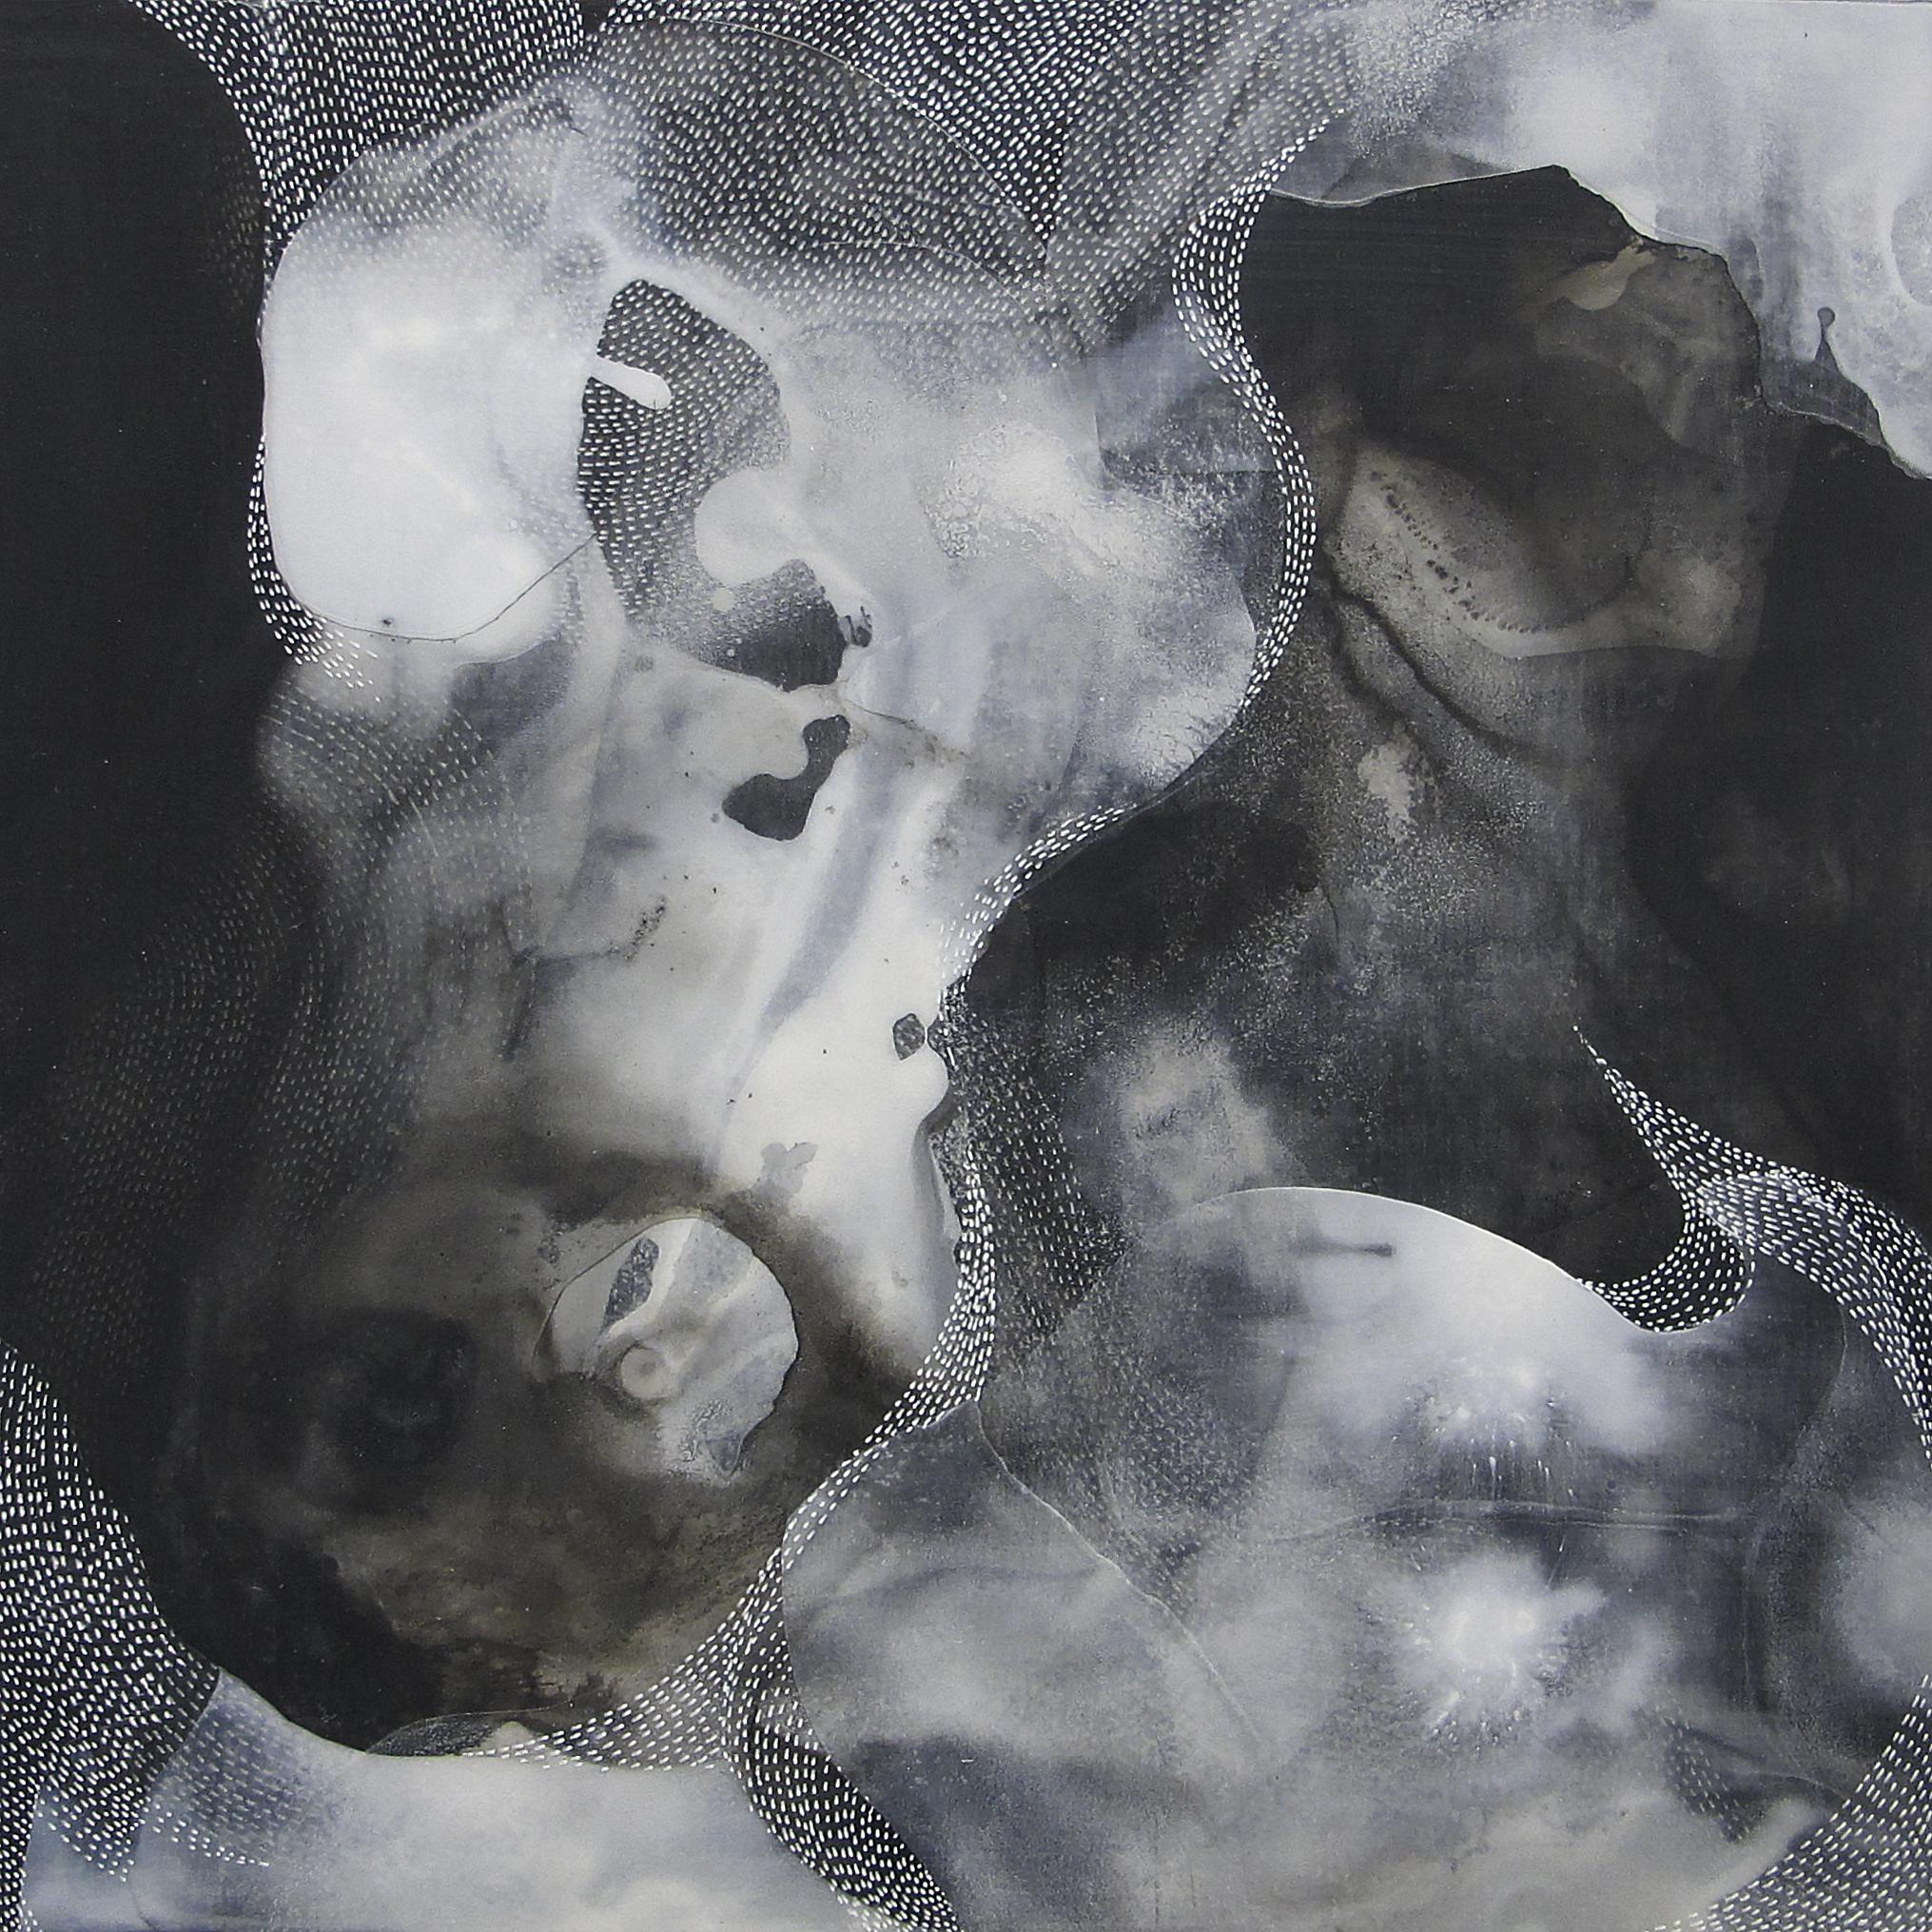 Stratum 02, mixedmedia, 10x12 in., 2015